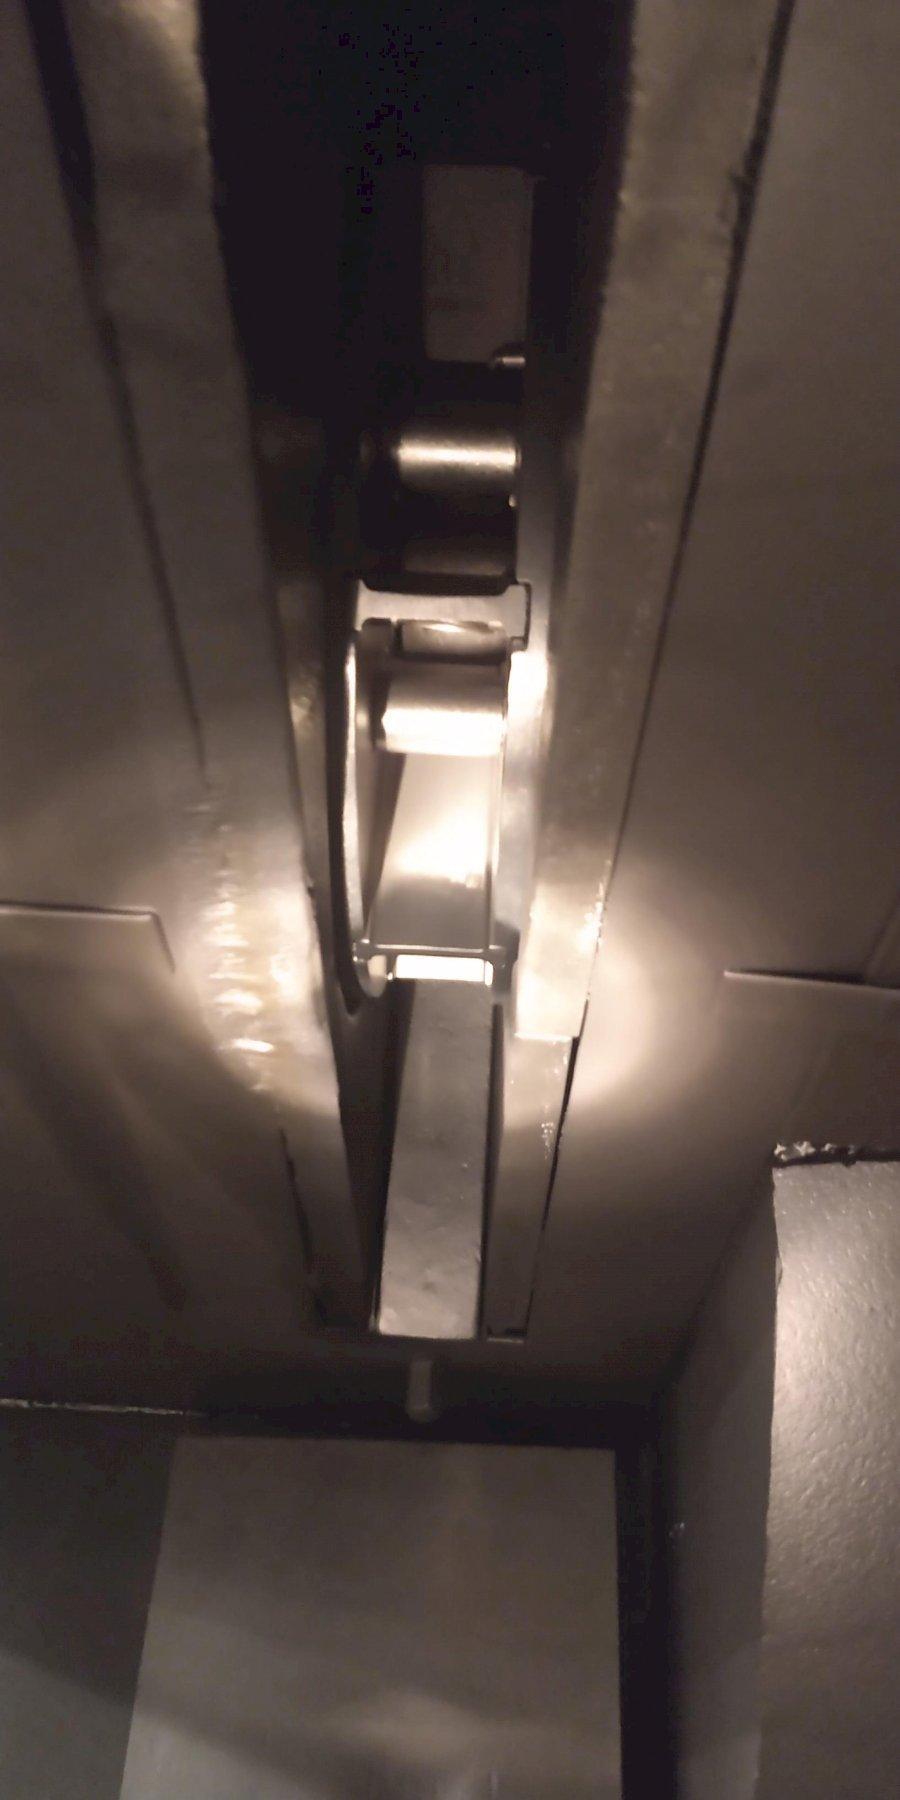 "96"" WHEELABRATOR SWING TABLE TYPE SHOTBLAST MACHINE. STOCK # 1161320"